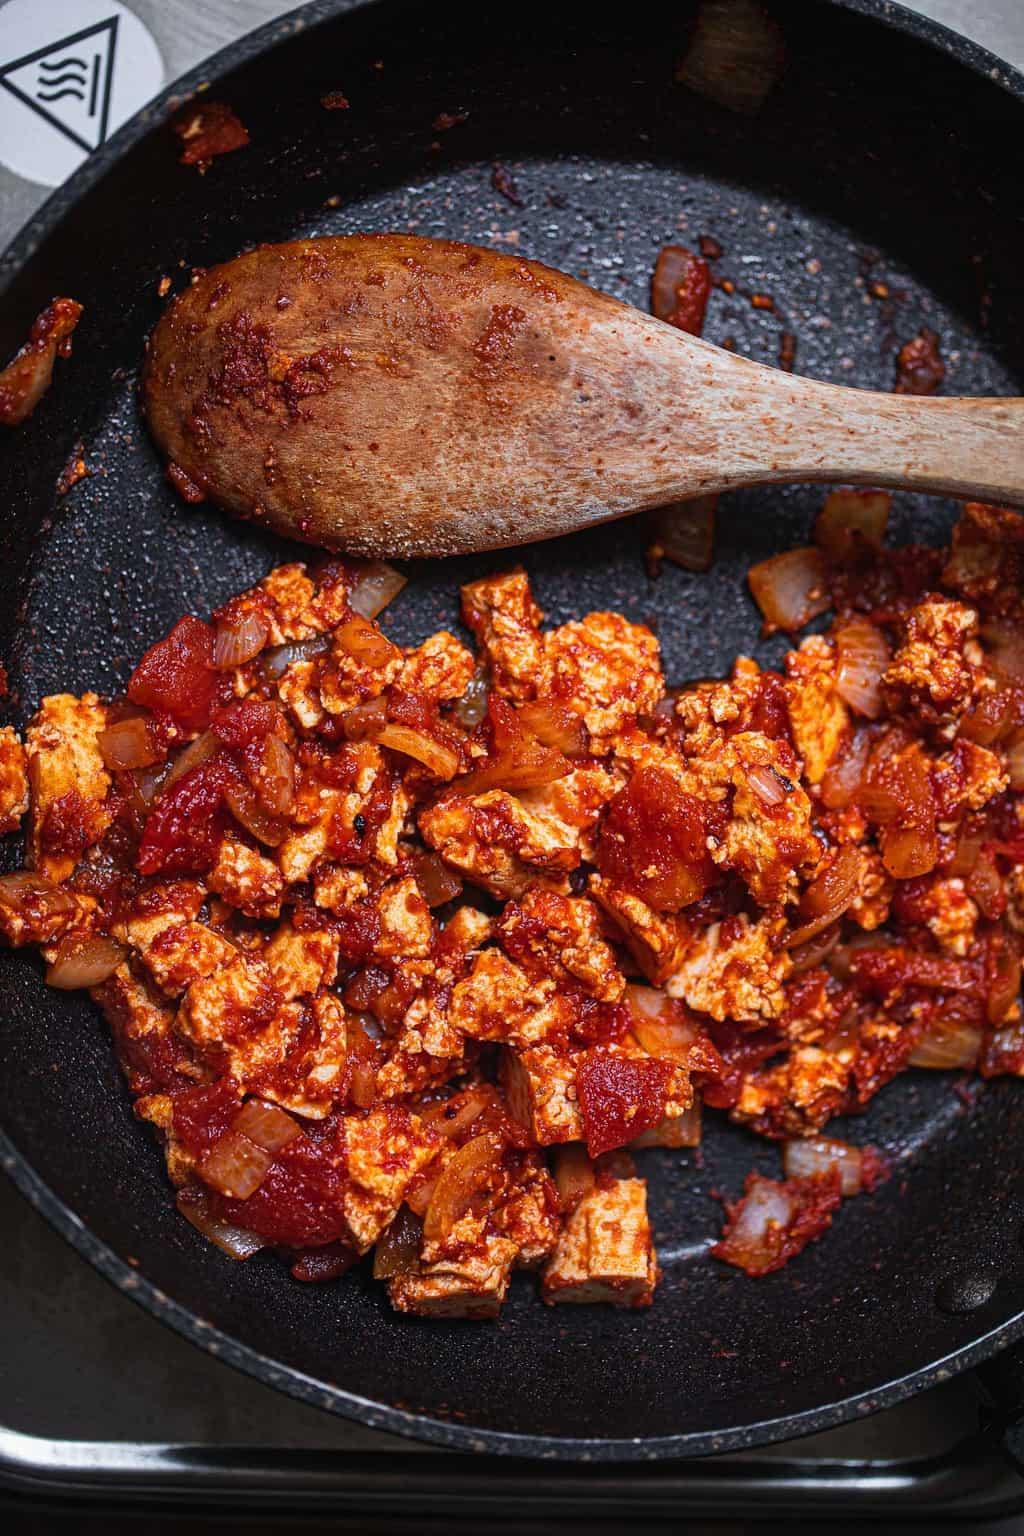 Vegan pizza sauce in a frying pan